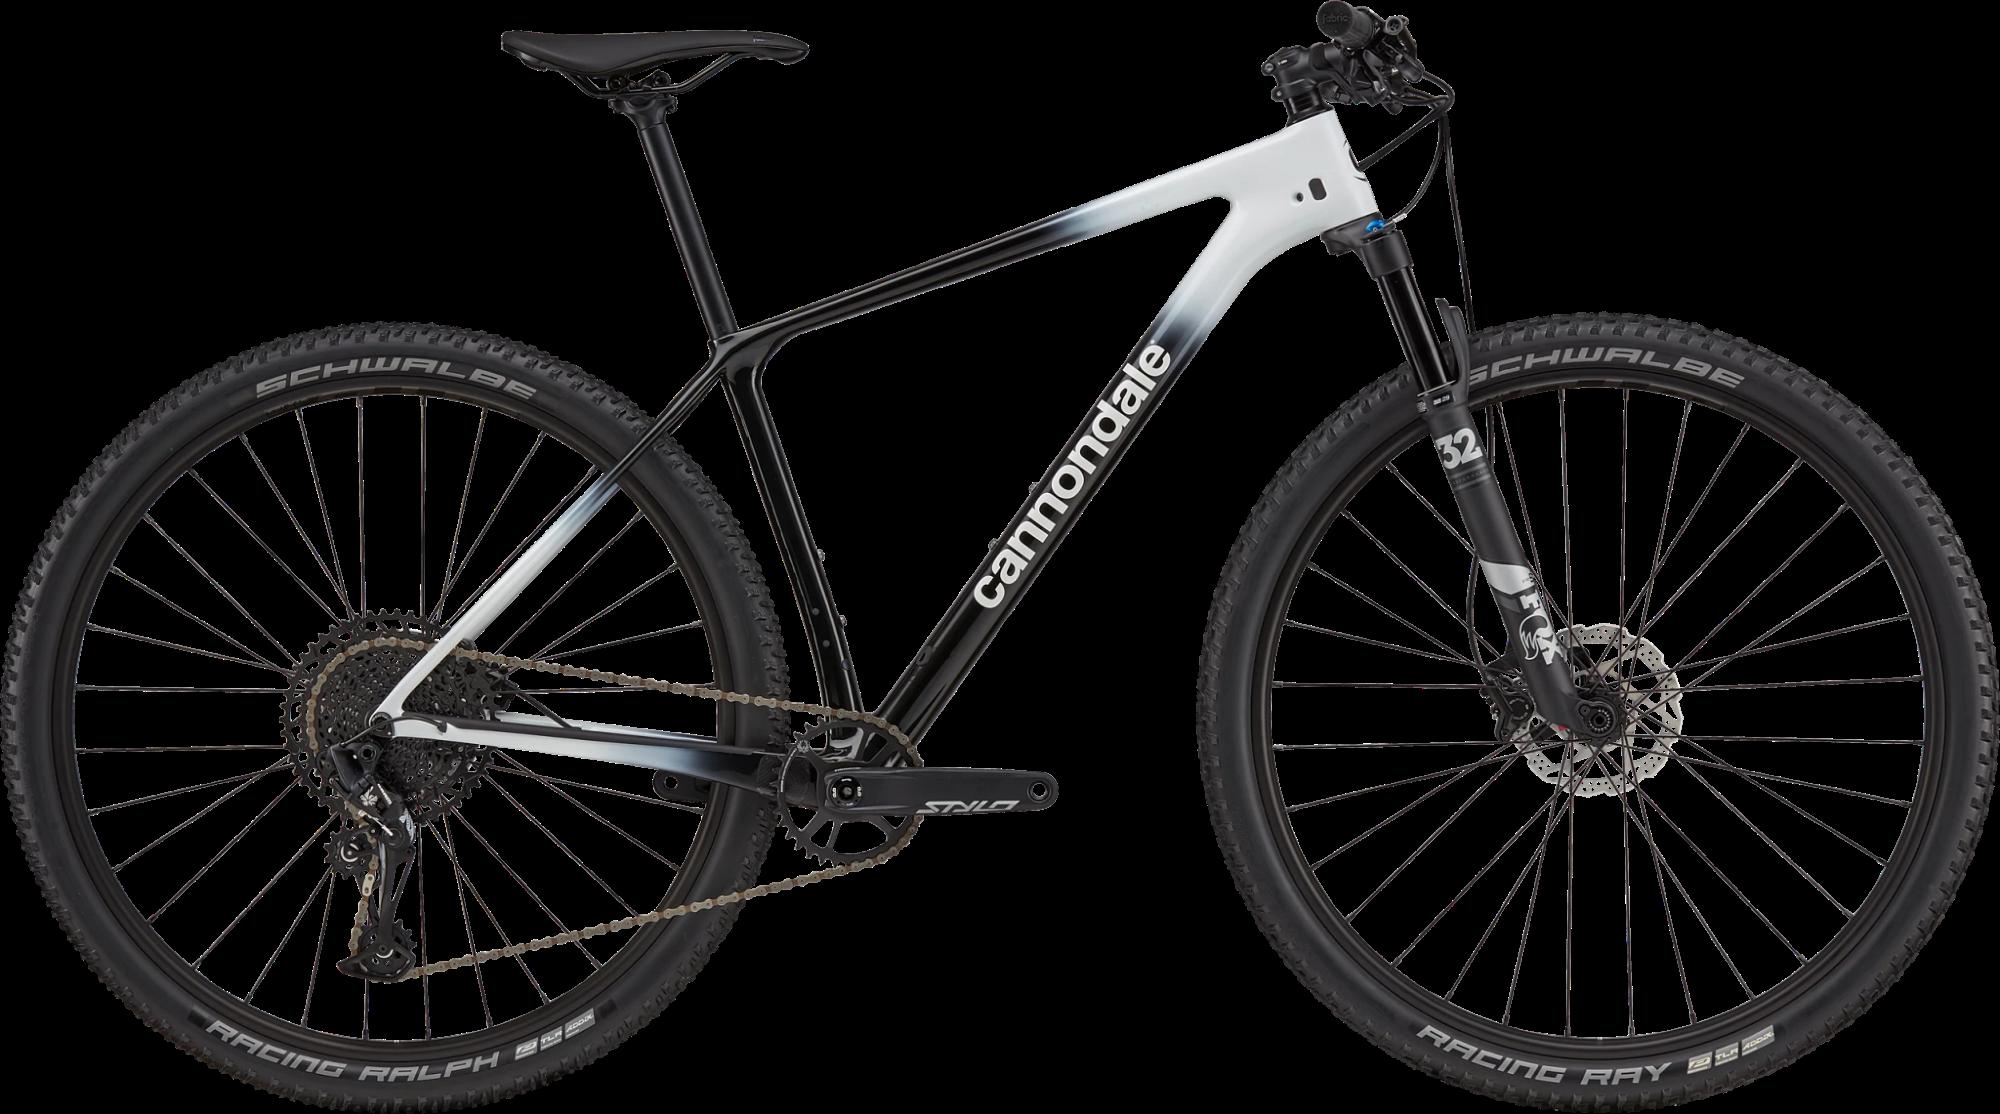 Cannondale FSi Carbon 5 Hardtail Mountain Bike 2021 Cashmere White